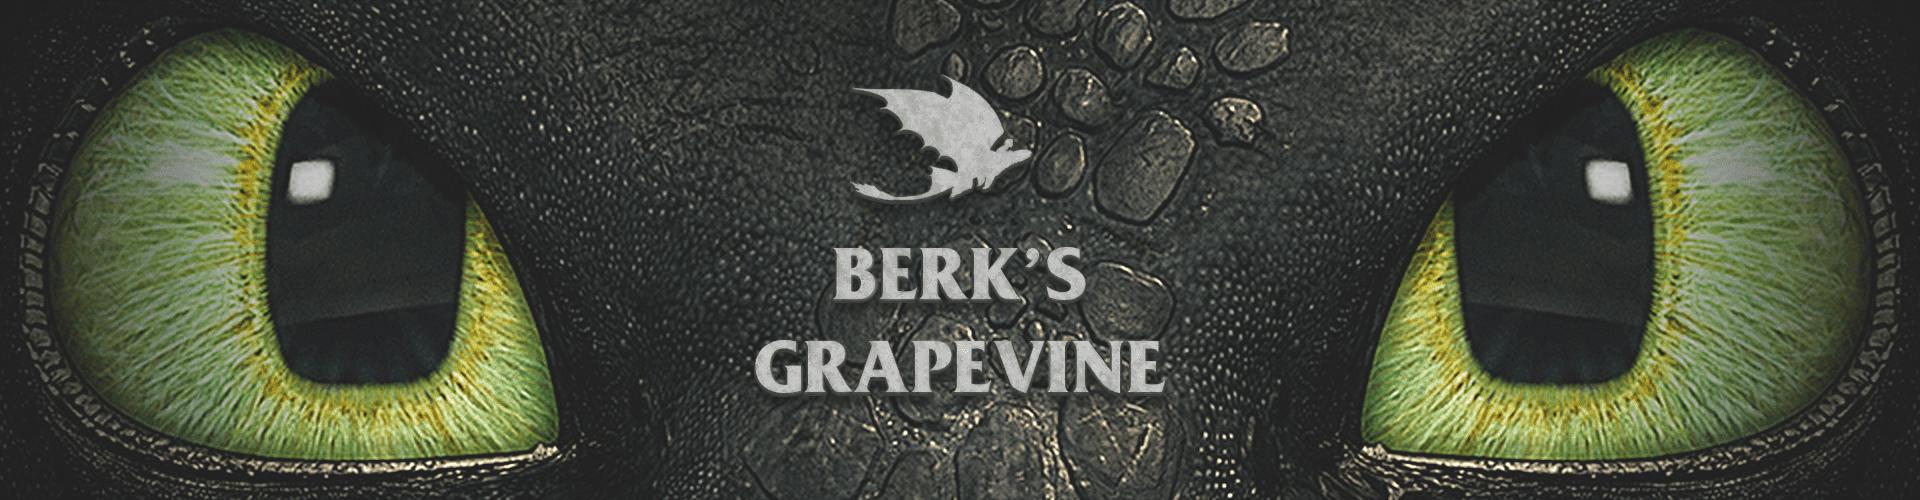 Berk's Grapevine